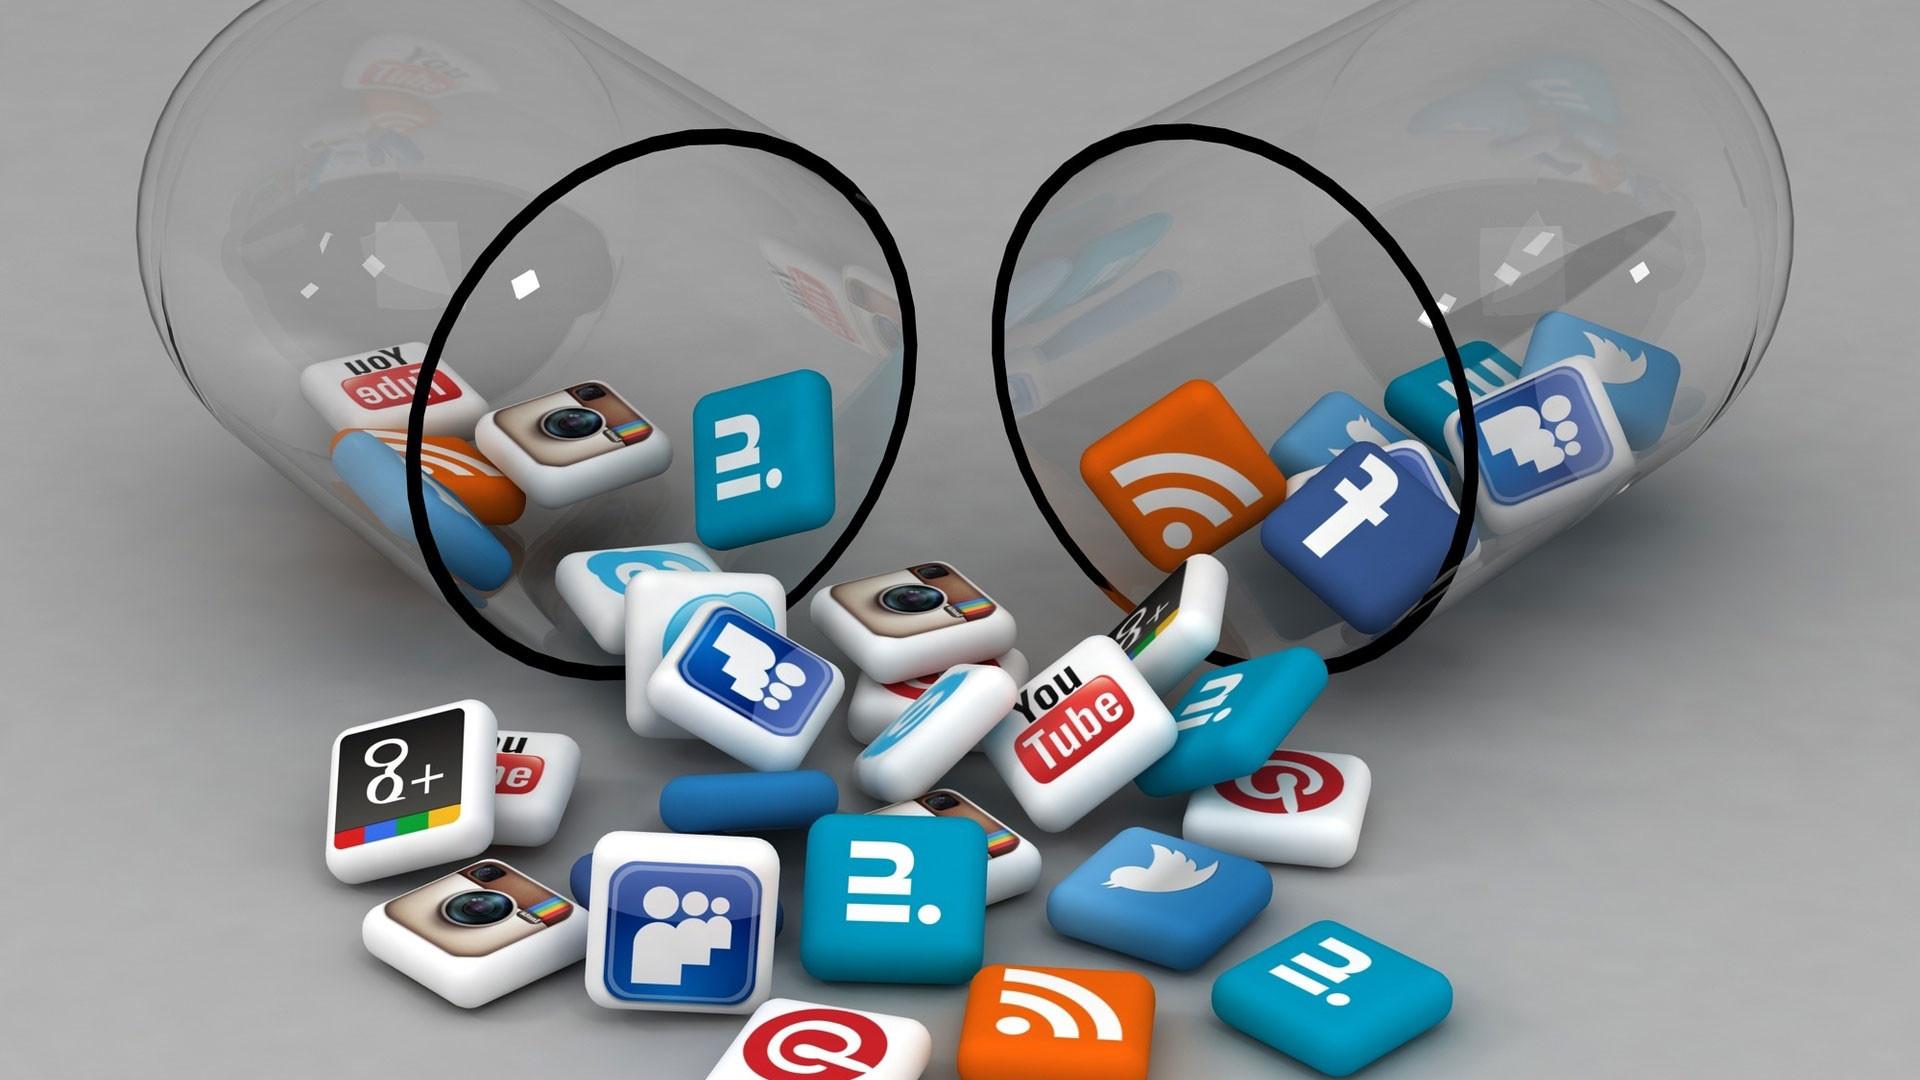 hd pics photos stunning attractive social media 4 hd desktop background  wallpaper